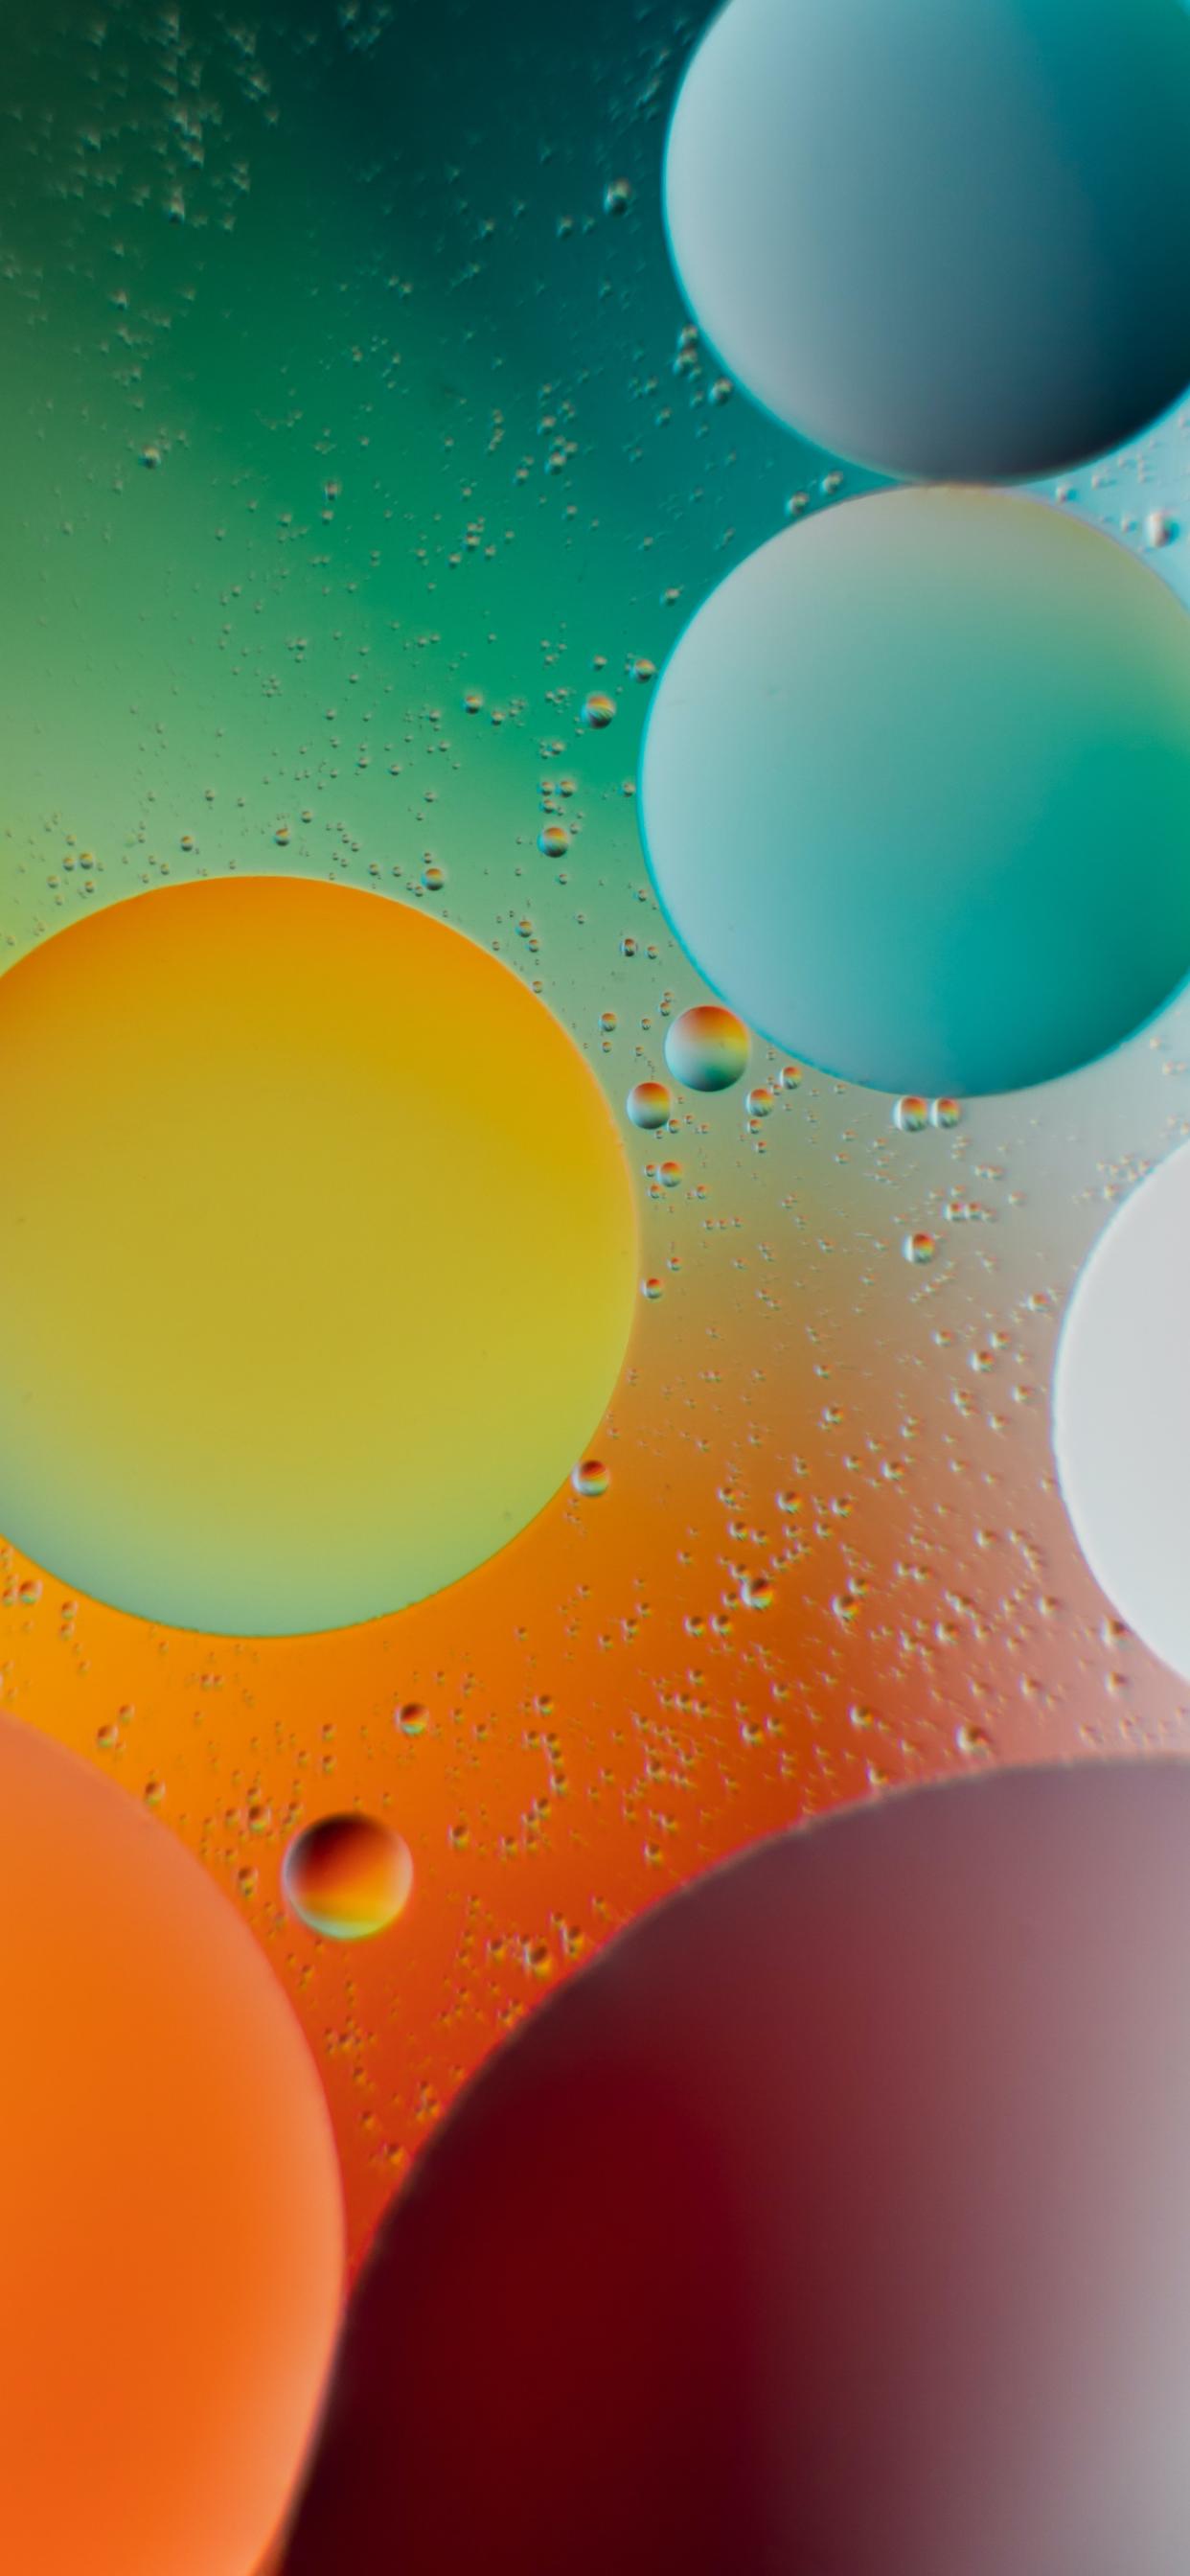 iPhone wallpapers abstract bubbles first Fonds d'écran iPhone du 13/05/2020